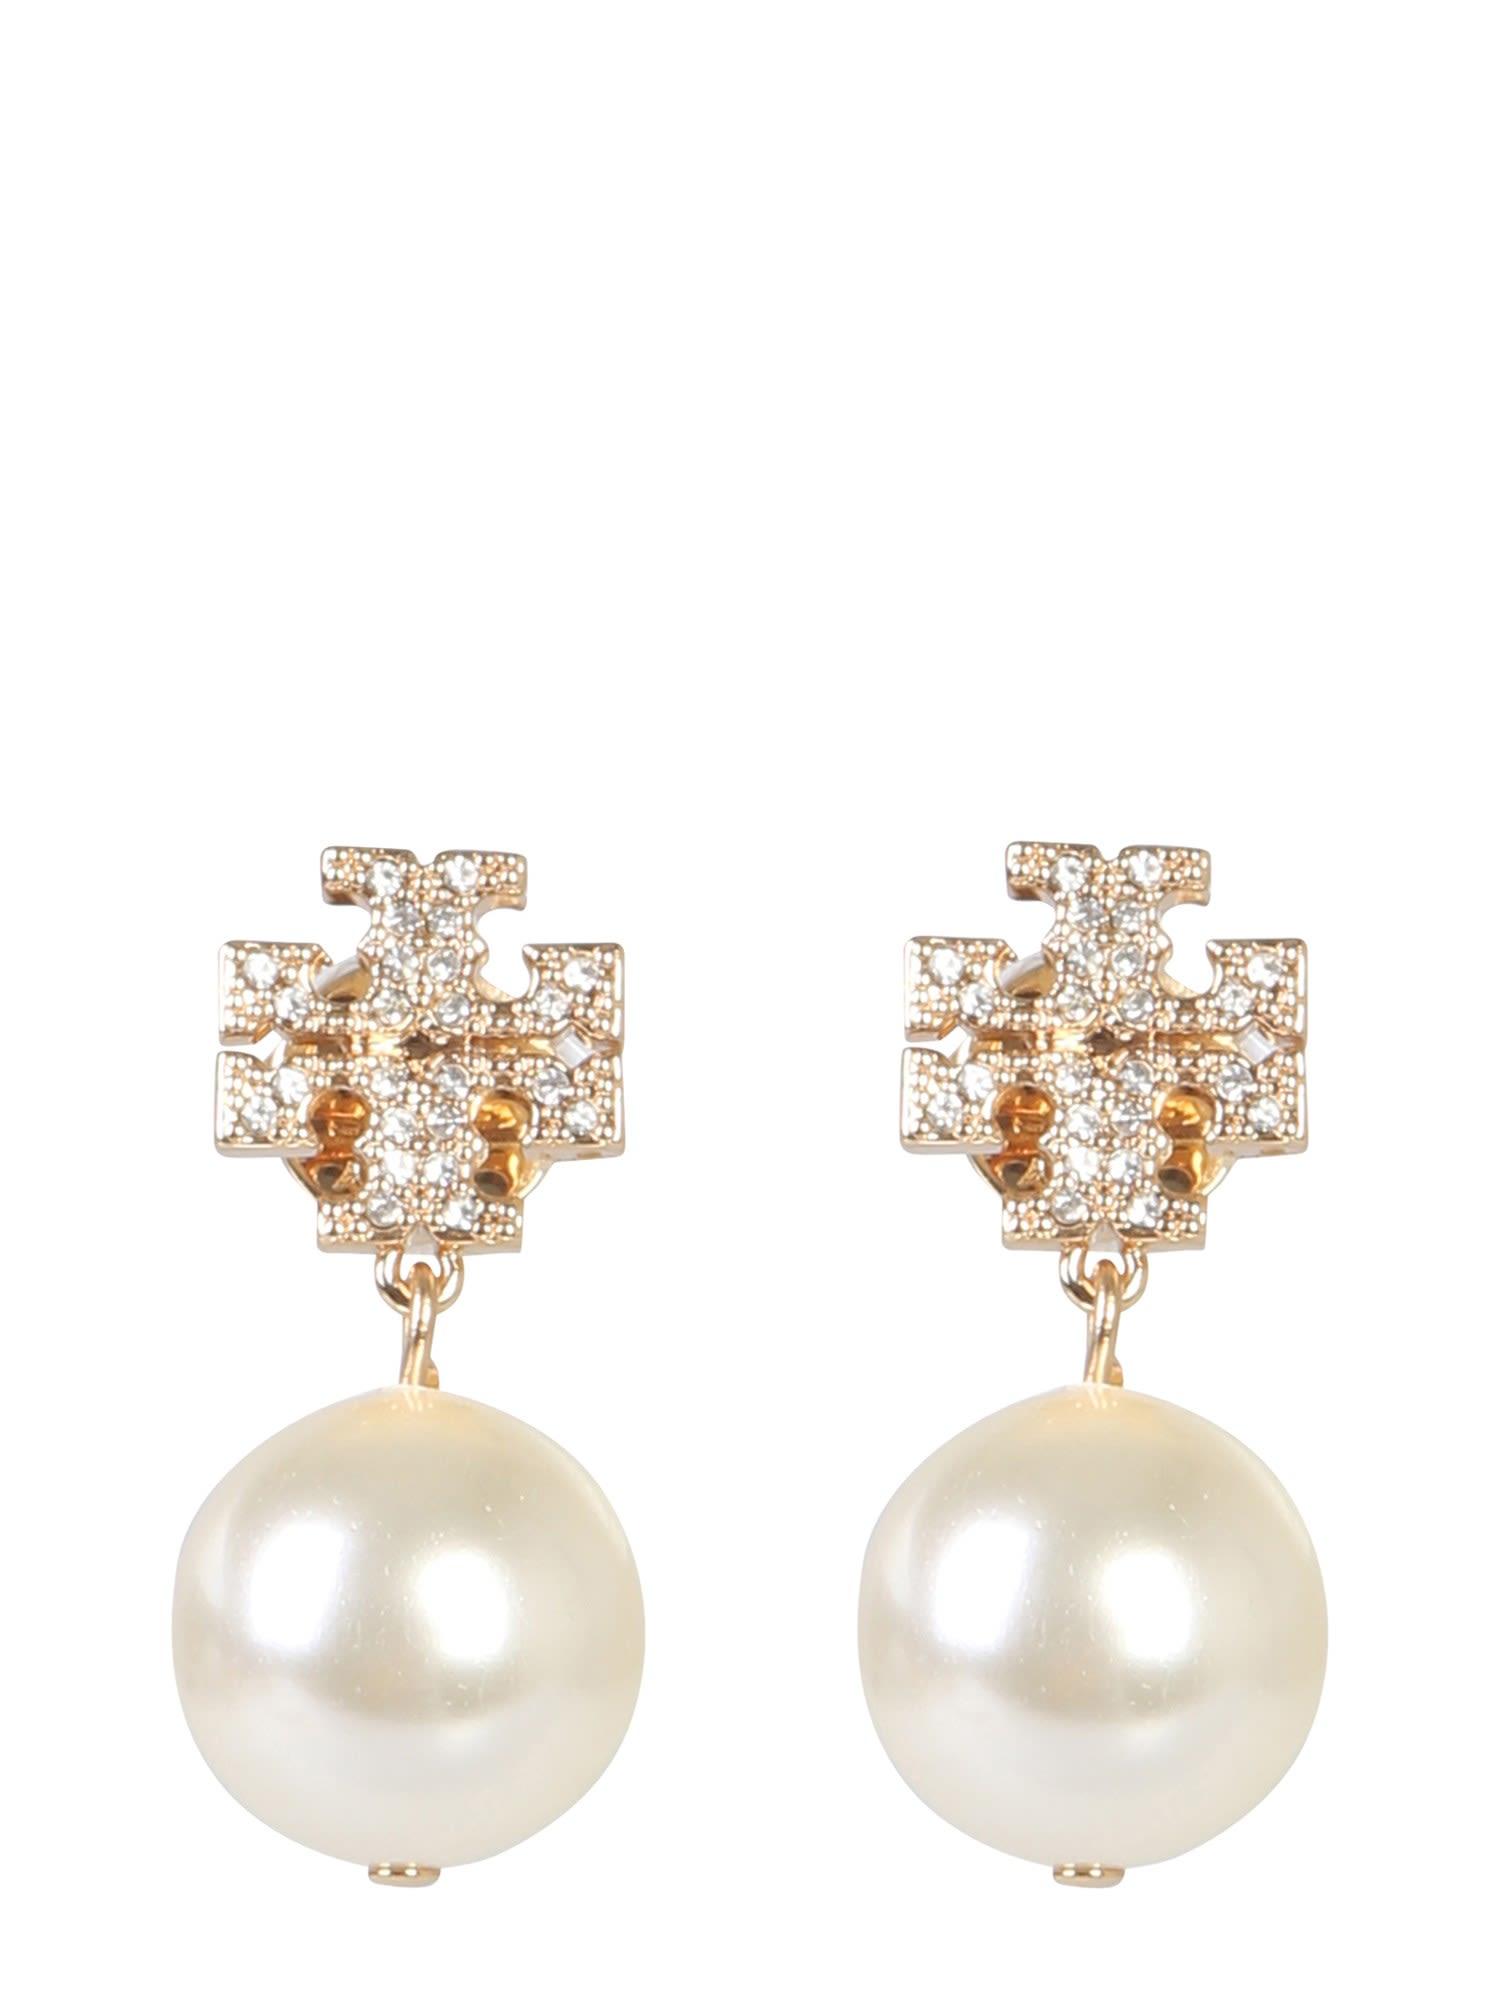 c4f9d290edf885 Tory Burch Tory Burch Crystal Logo And Pendant Pearl Earrings - ORO ...